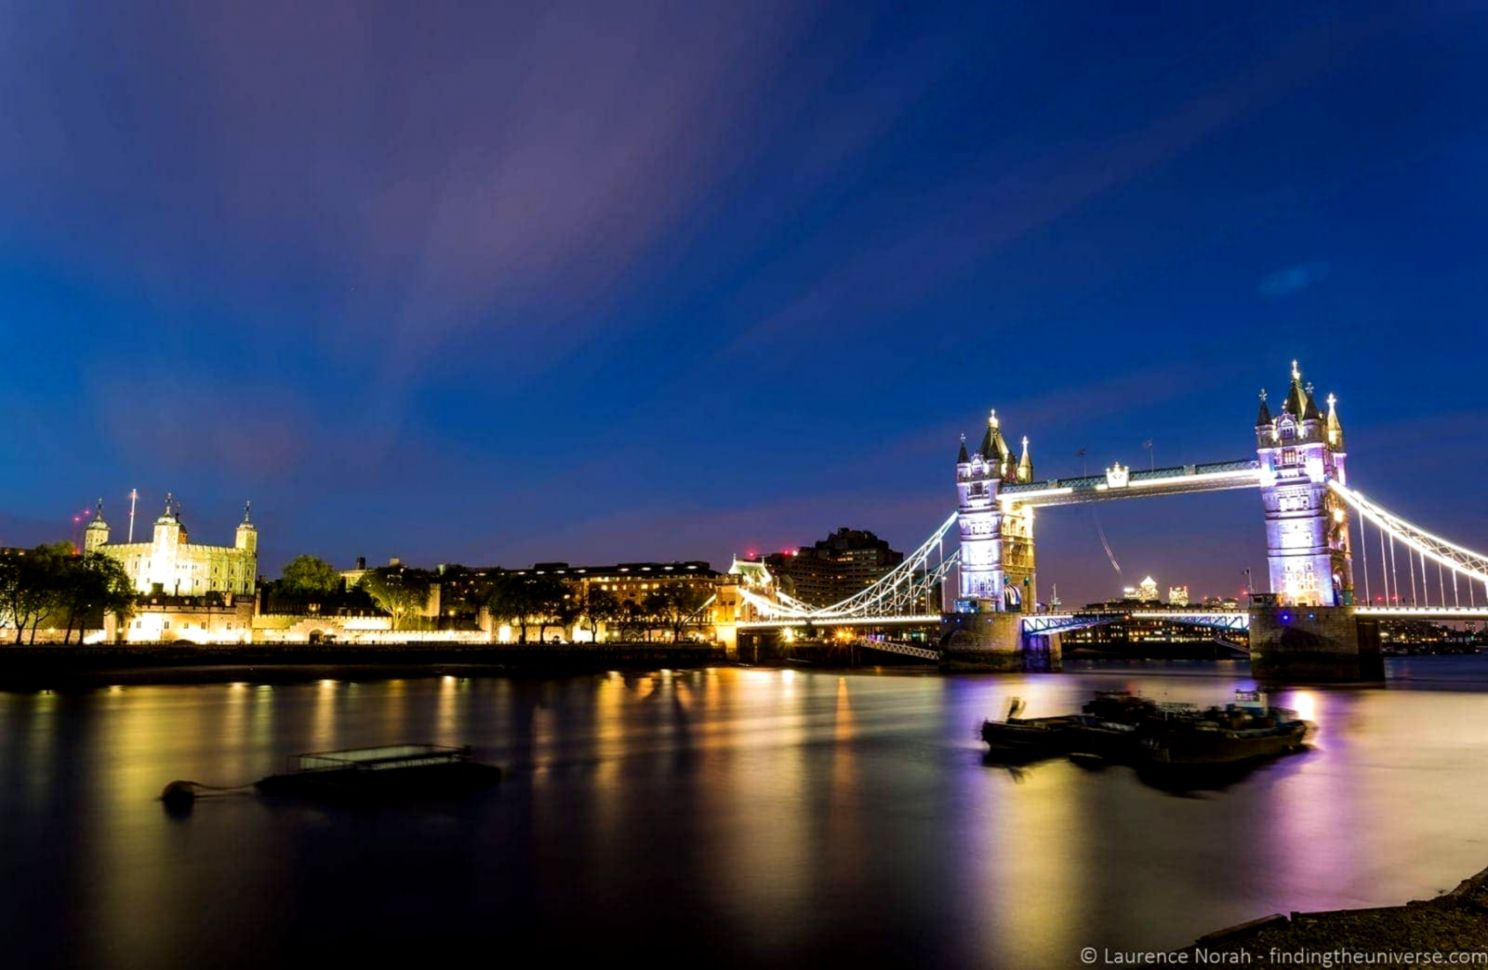 Landscape Night Photography London | Wallpapers Legend